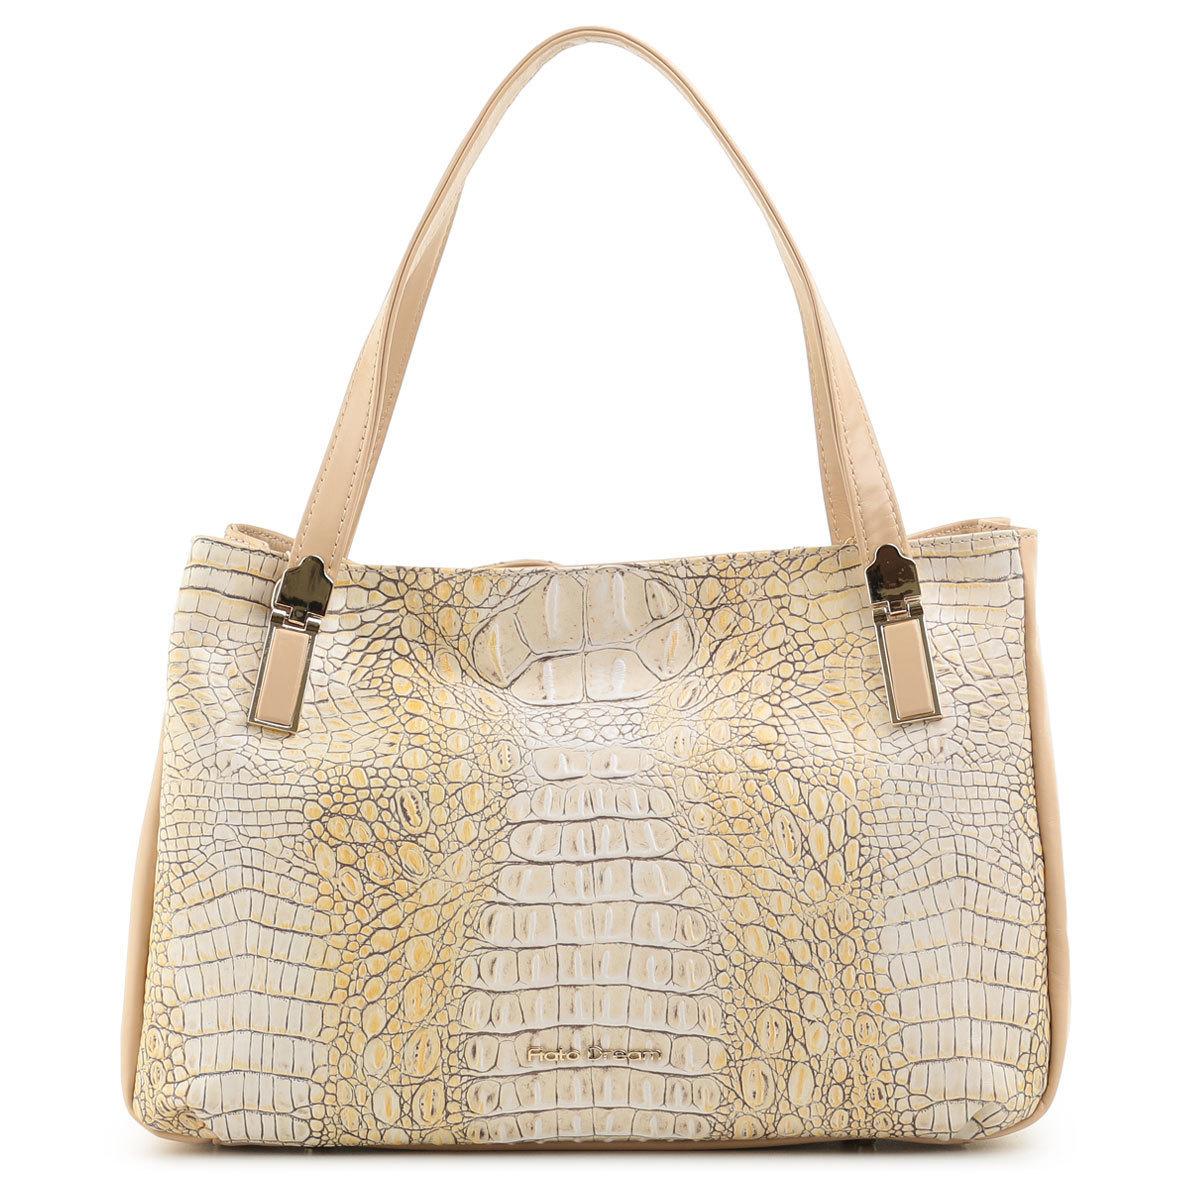 3814 FD кожа /крокодил желтый (сумка женская)